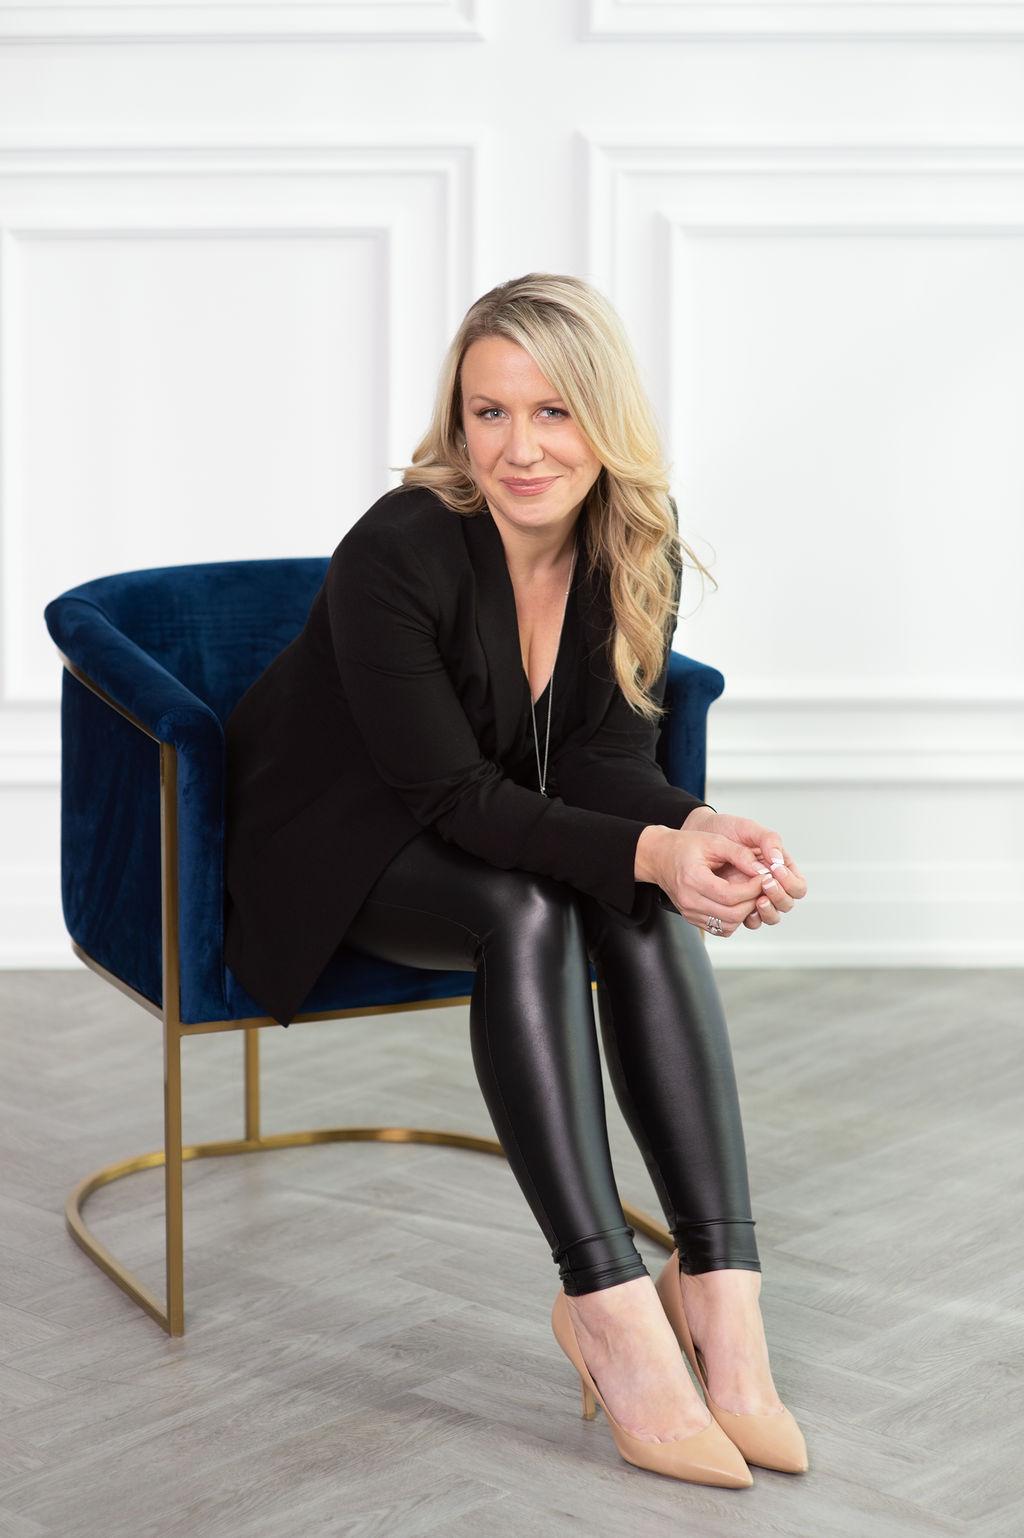 Jennifer sitting in a chair